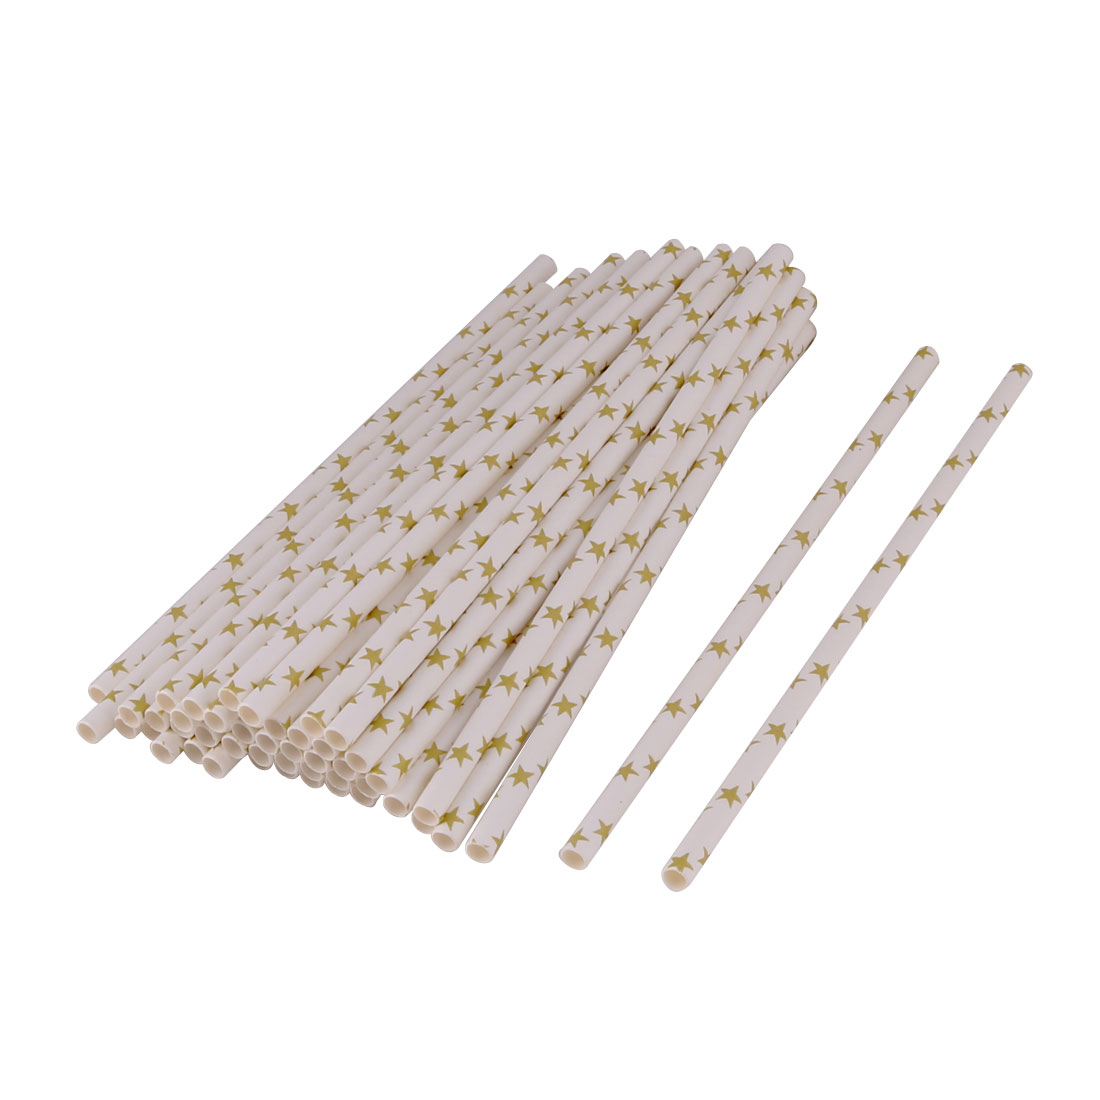 Household Kitchen Paper Star Pattern Drinking Water Coffee Juice Tea Disposable Straws Glod Tone 50 Pcs